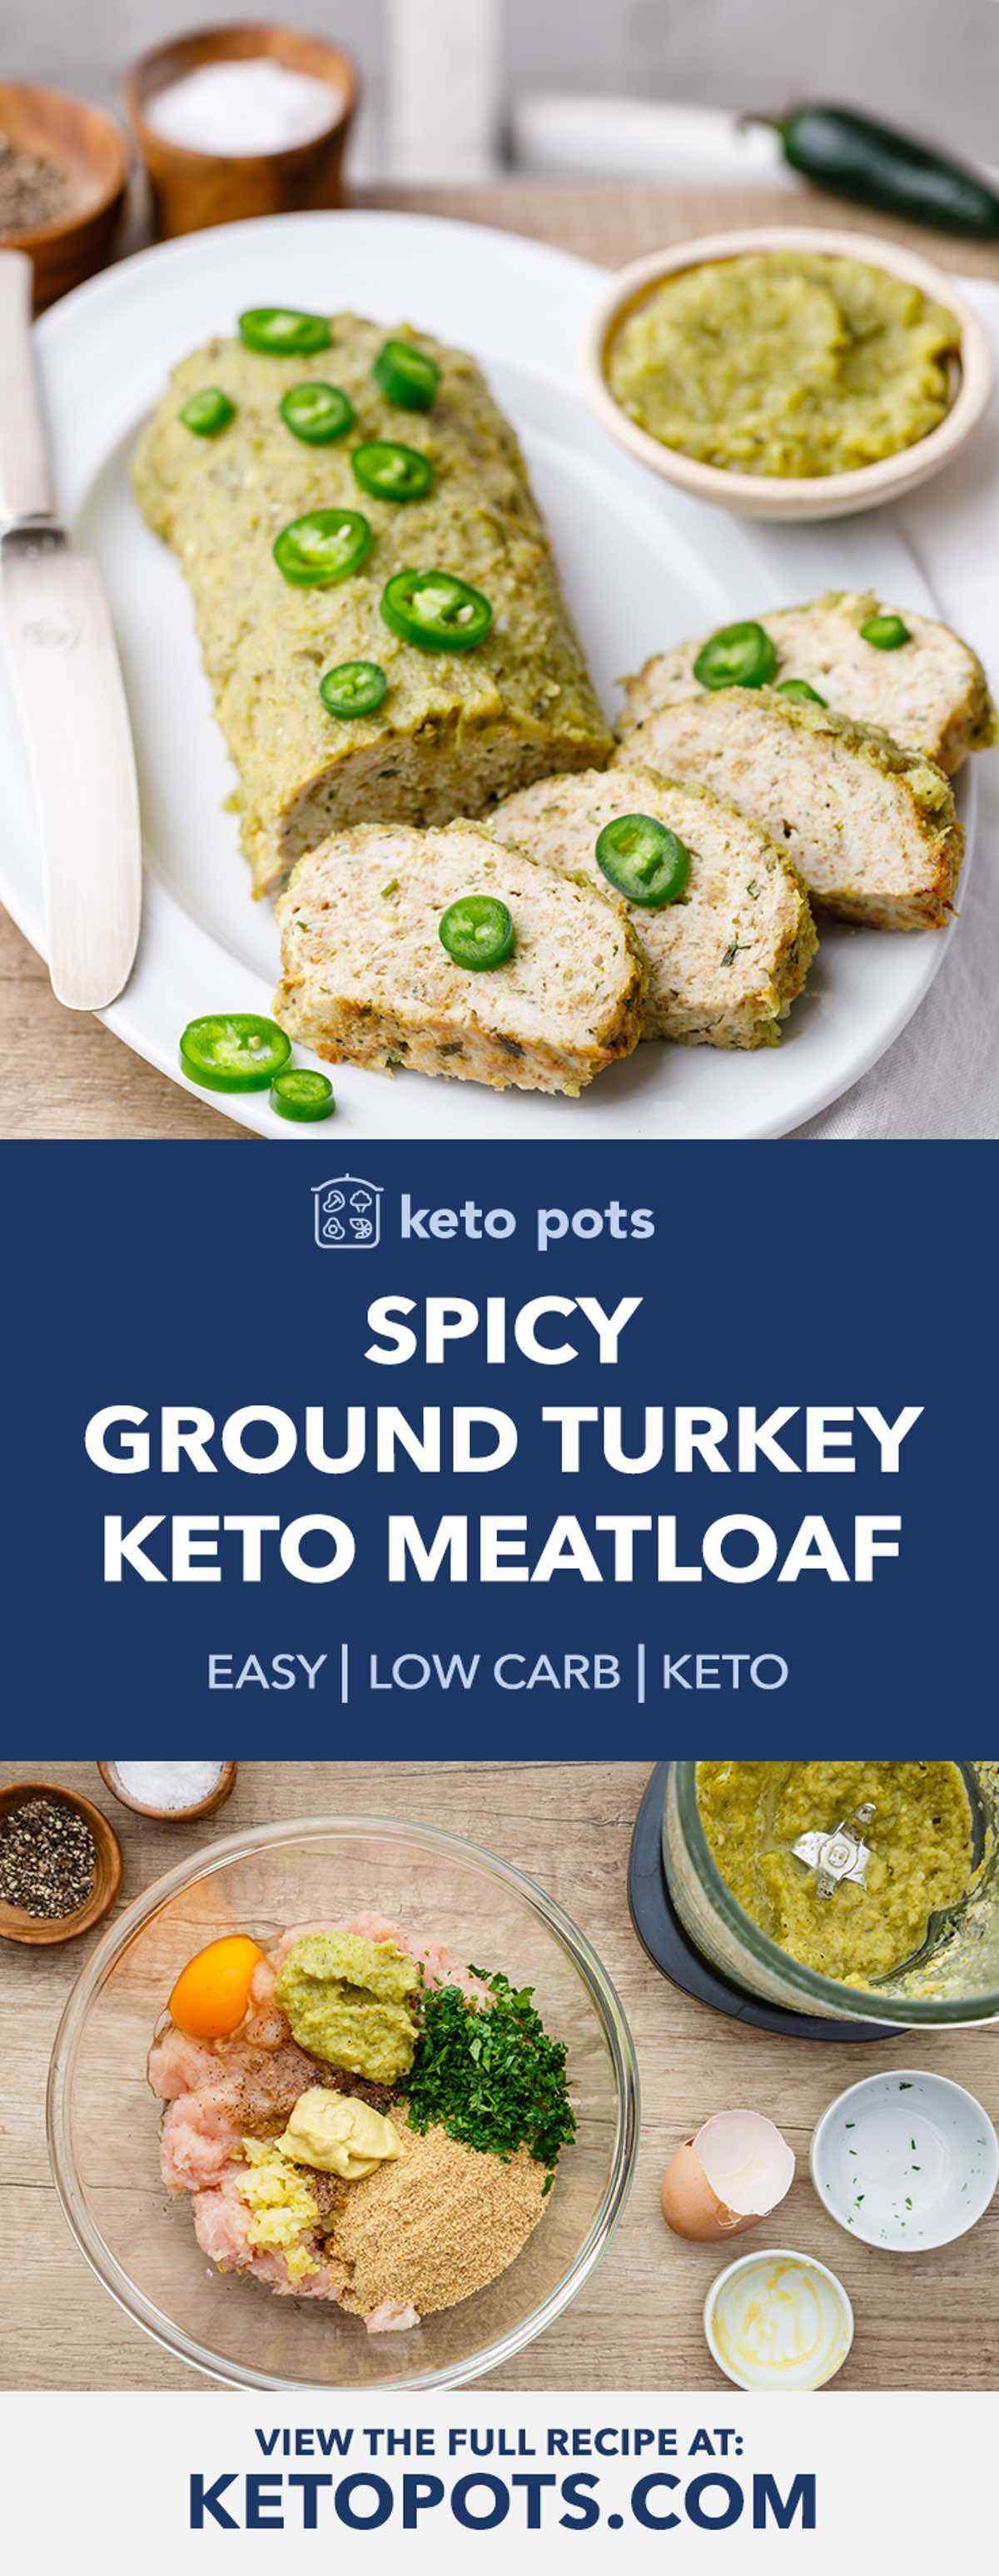 Keto Ground Turkey Meatloaf